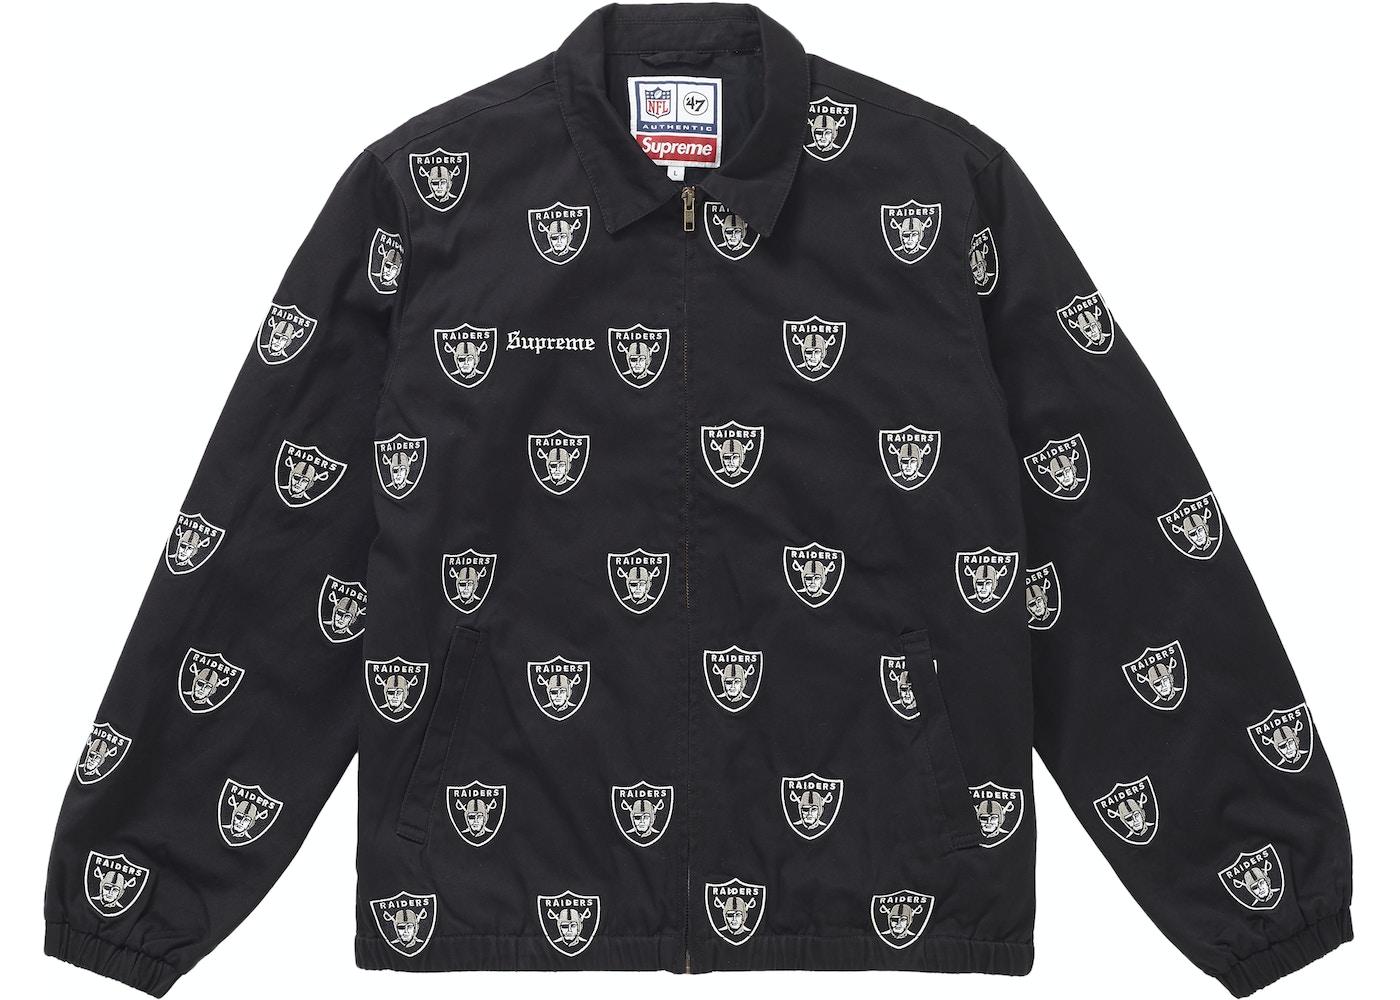 dde0a8c53ac Supreme NFL x Raiders x '47 Embroidered Harrington Jacket Black - SS19